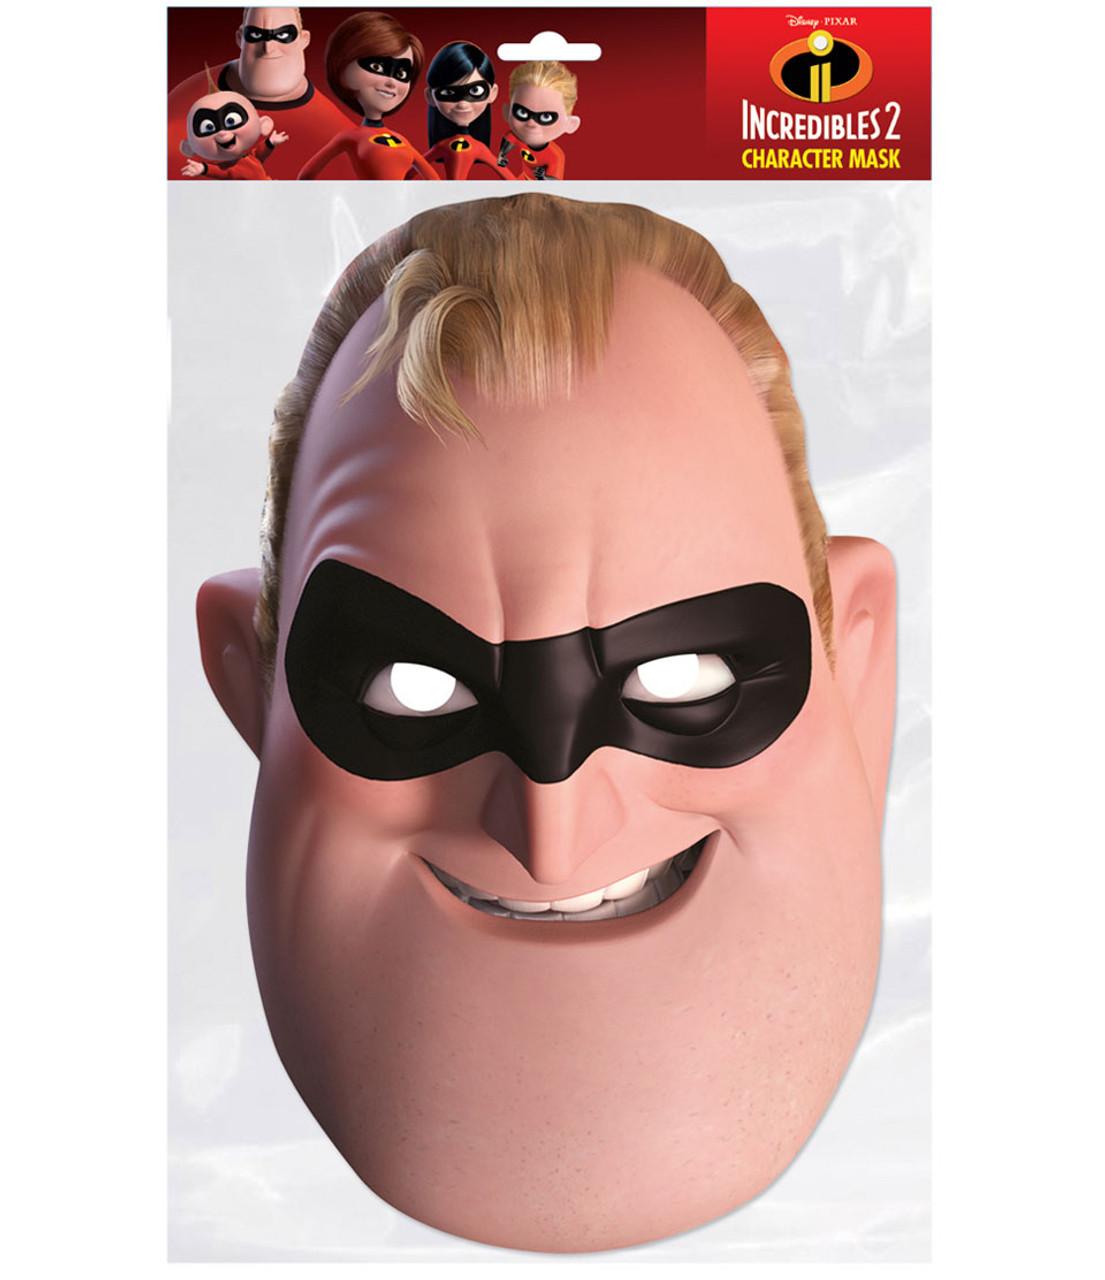 The Incredible 2 Superhero Party Face Mask Jack Jack Parr Mask